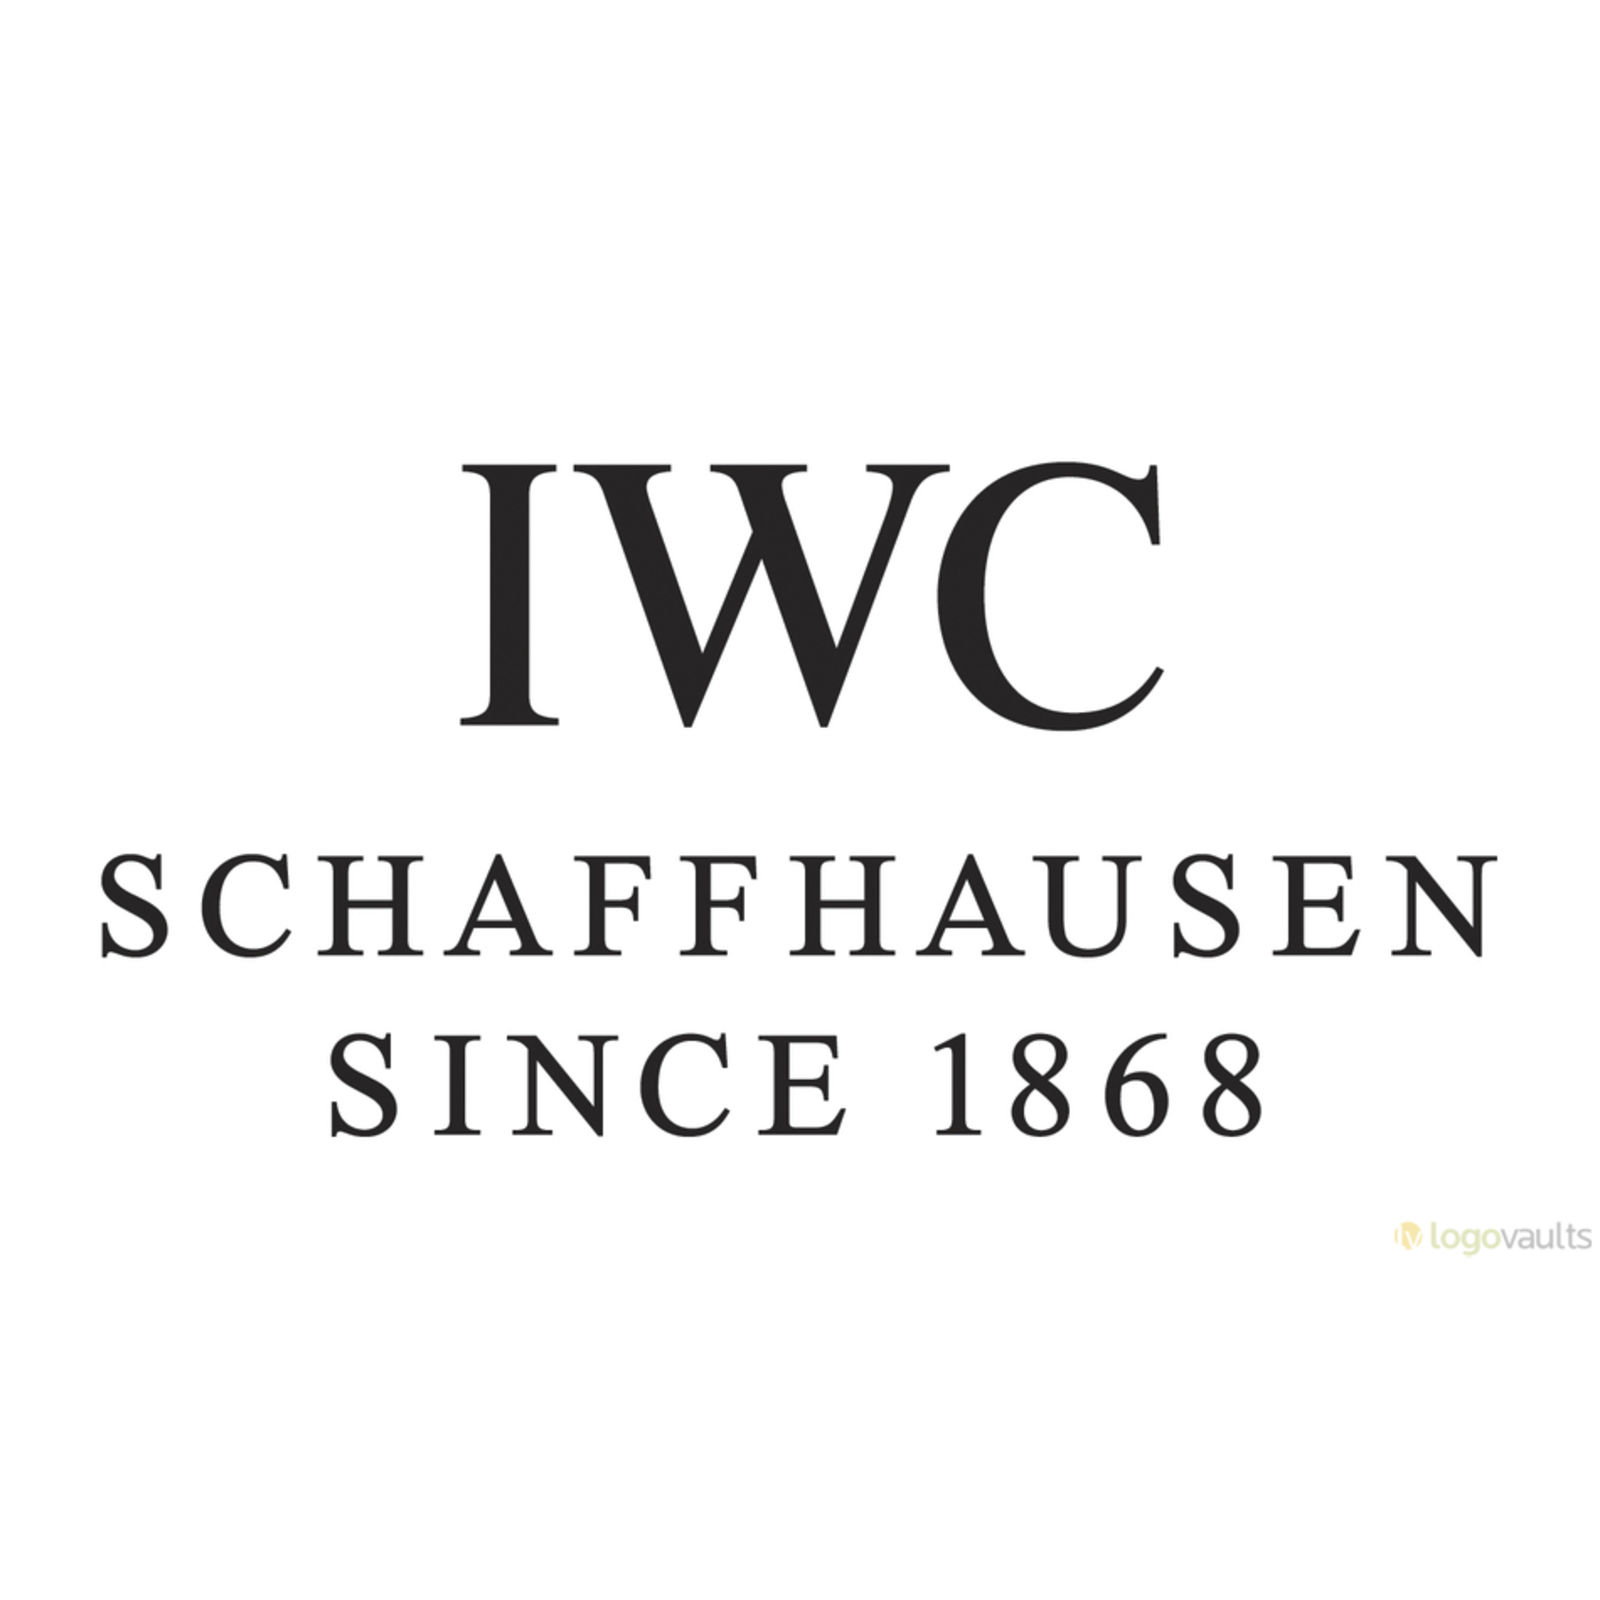 IWC (Bild 1)